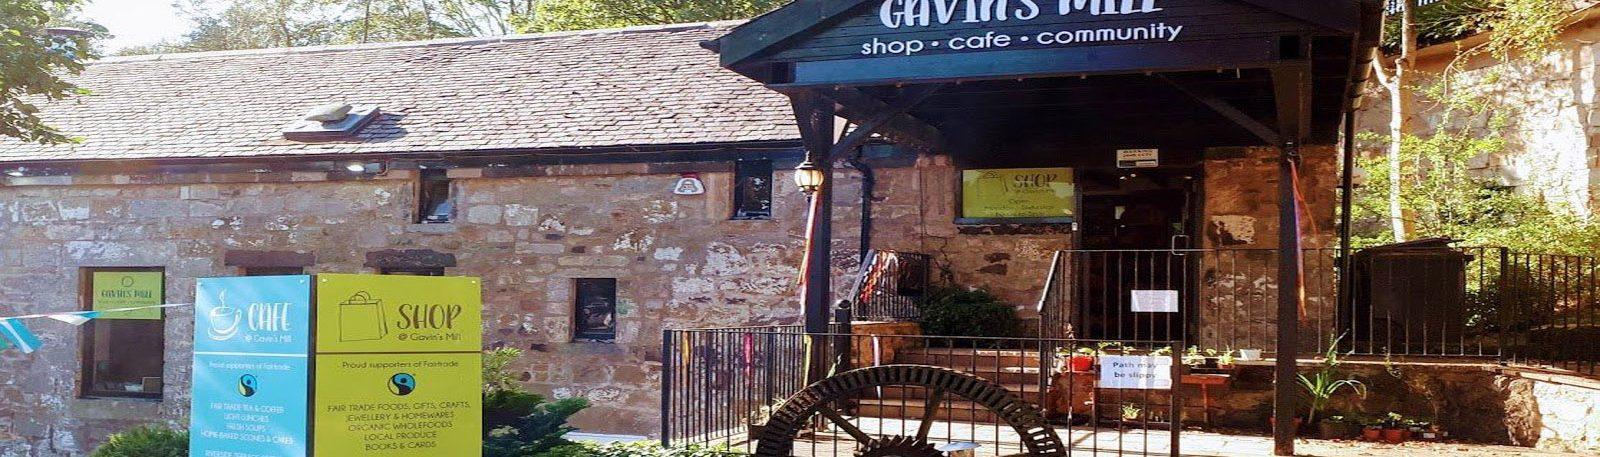 News Gavin's Mill Community Ownership